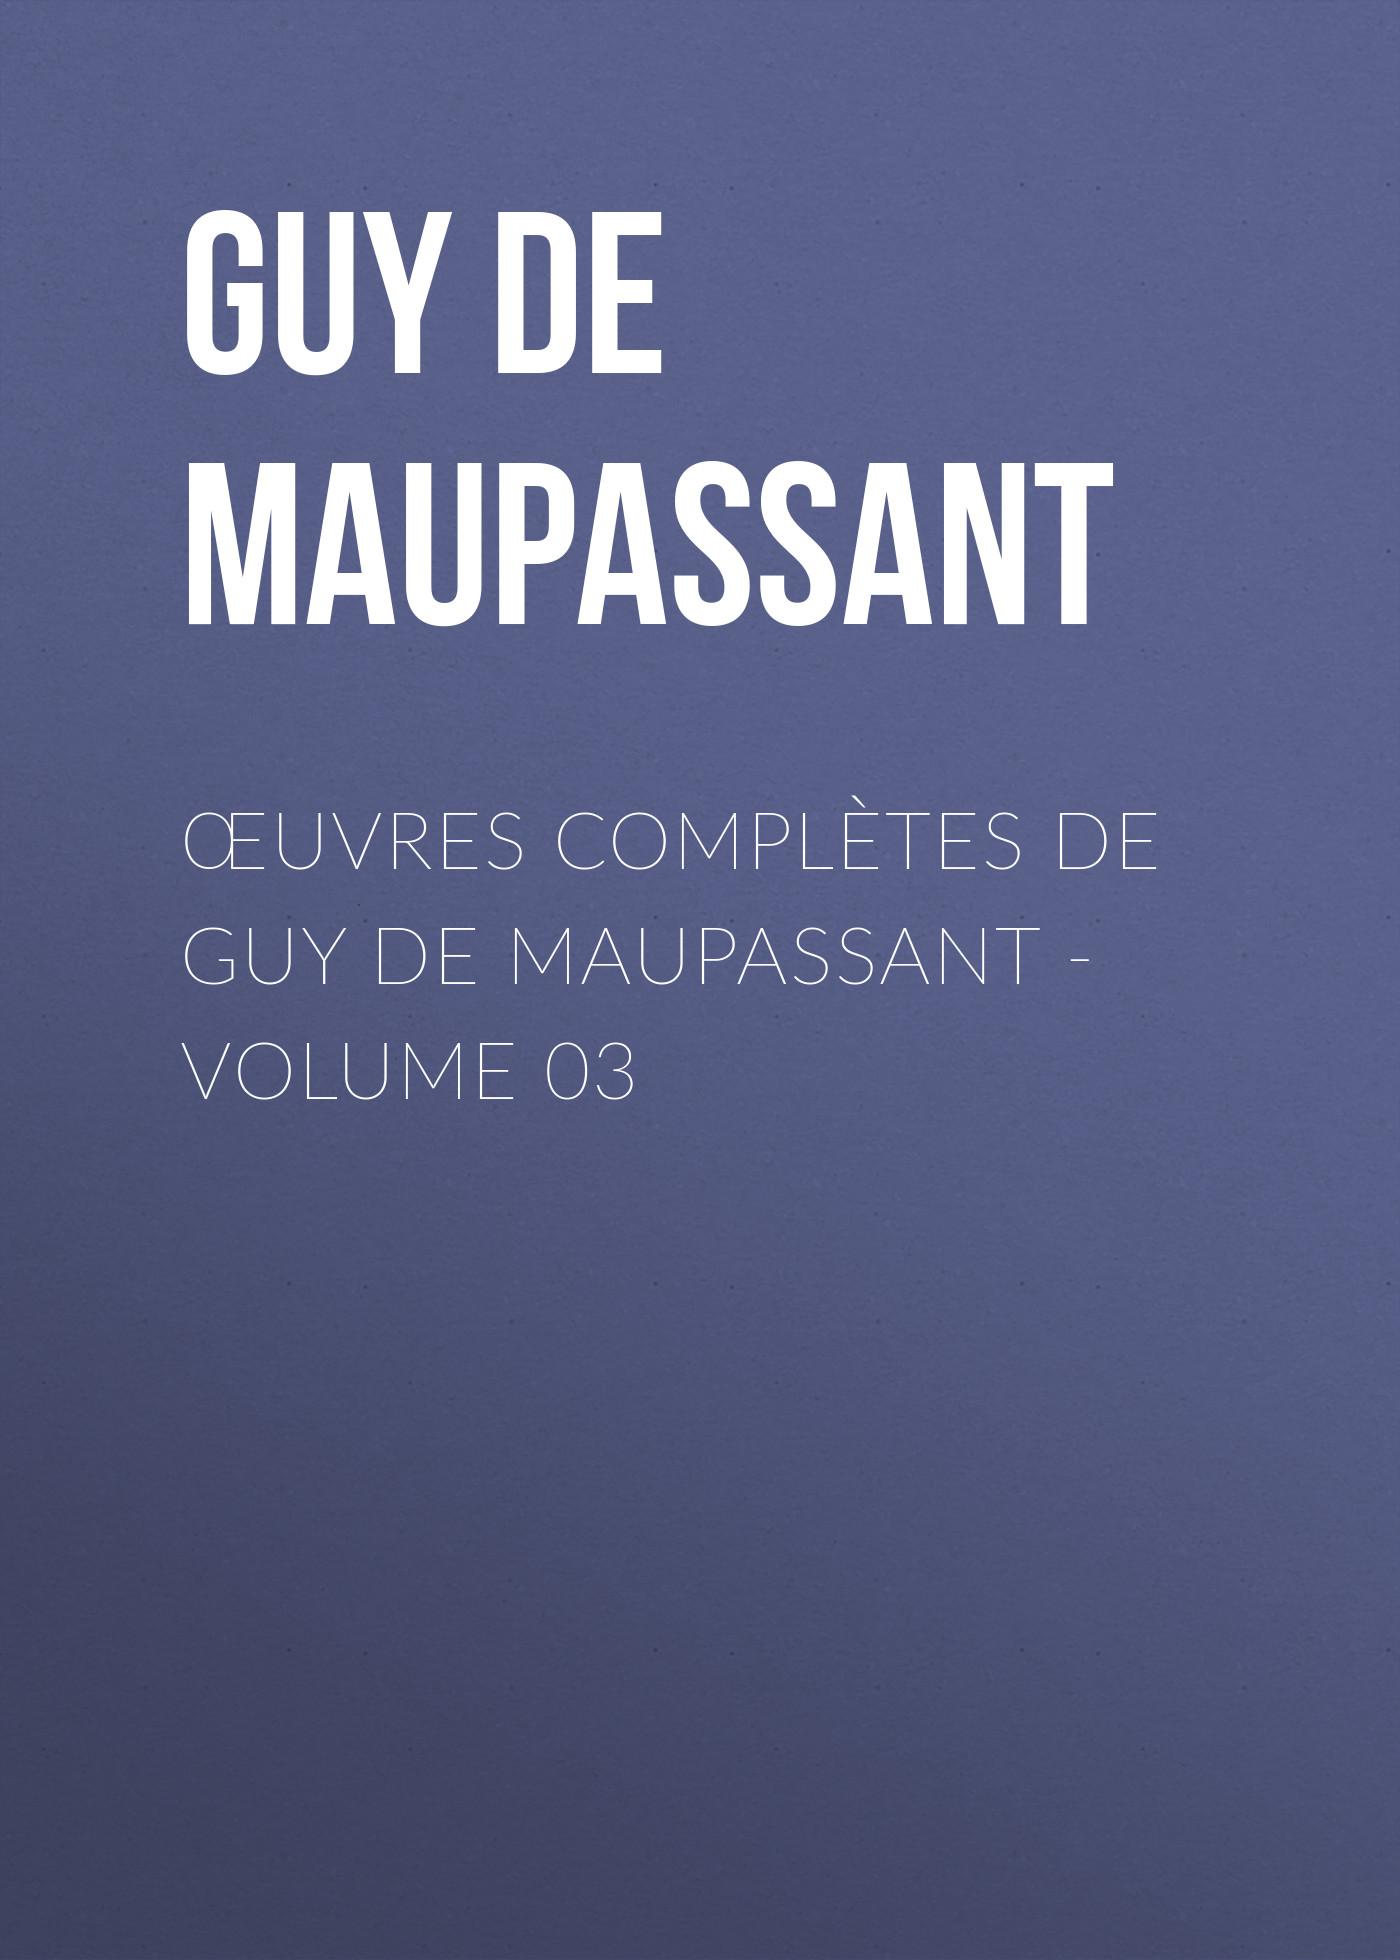 Ги де Мопассан Œuvres complètes de Guy de Maupassant - volume 03 ги де мопассан œuvres complètes de guy de maupassant volume 03